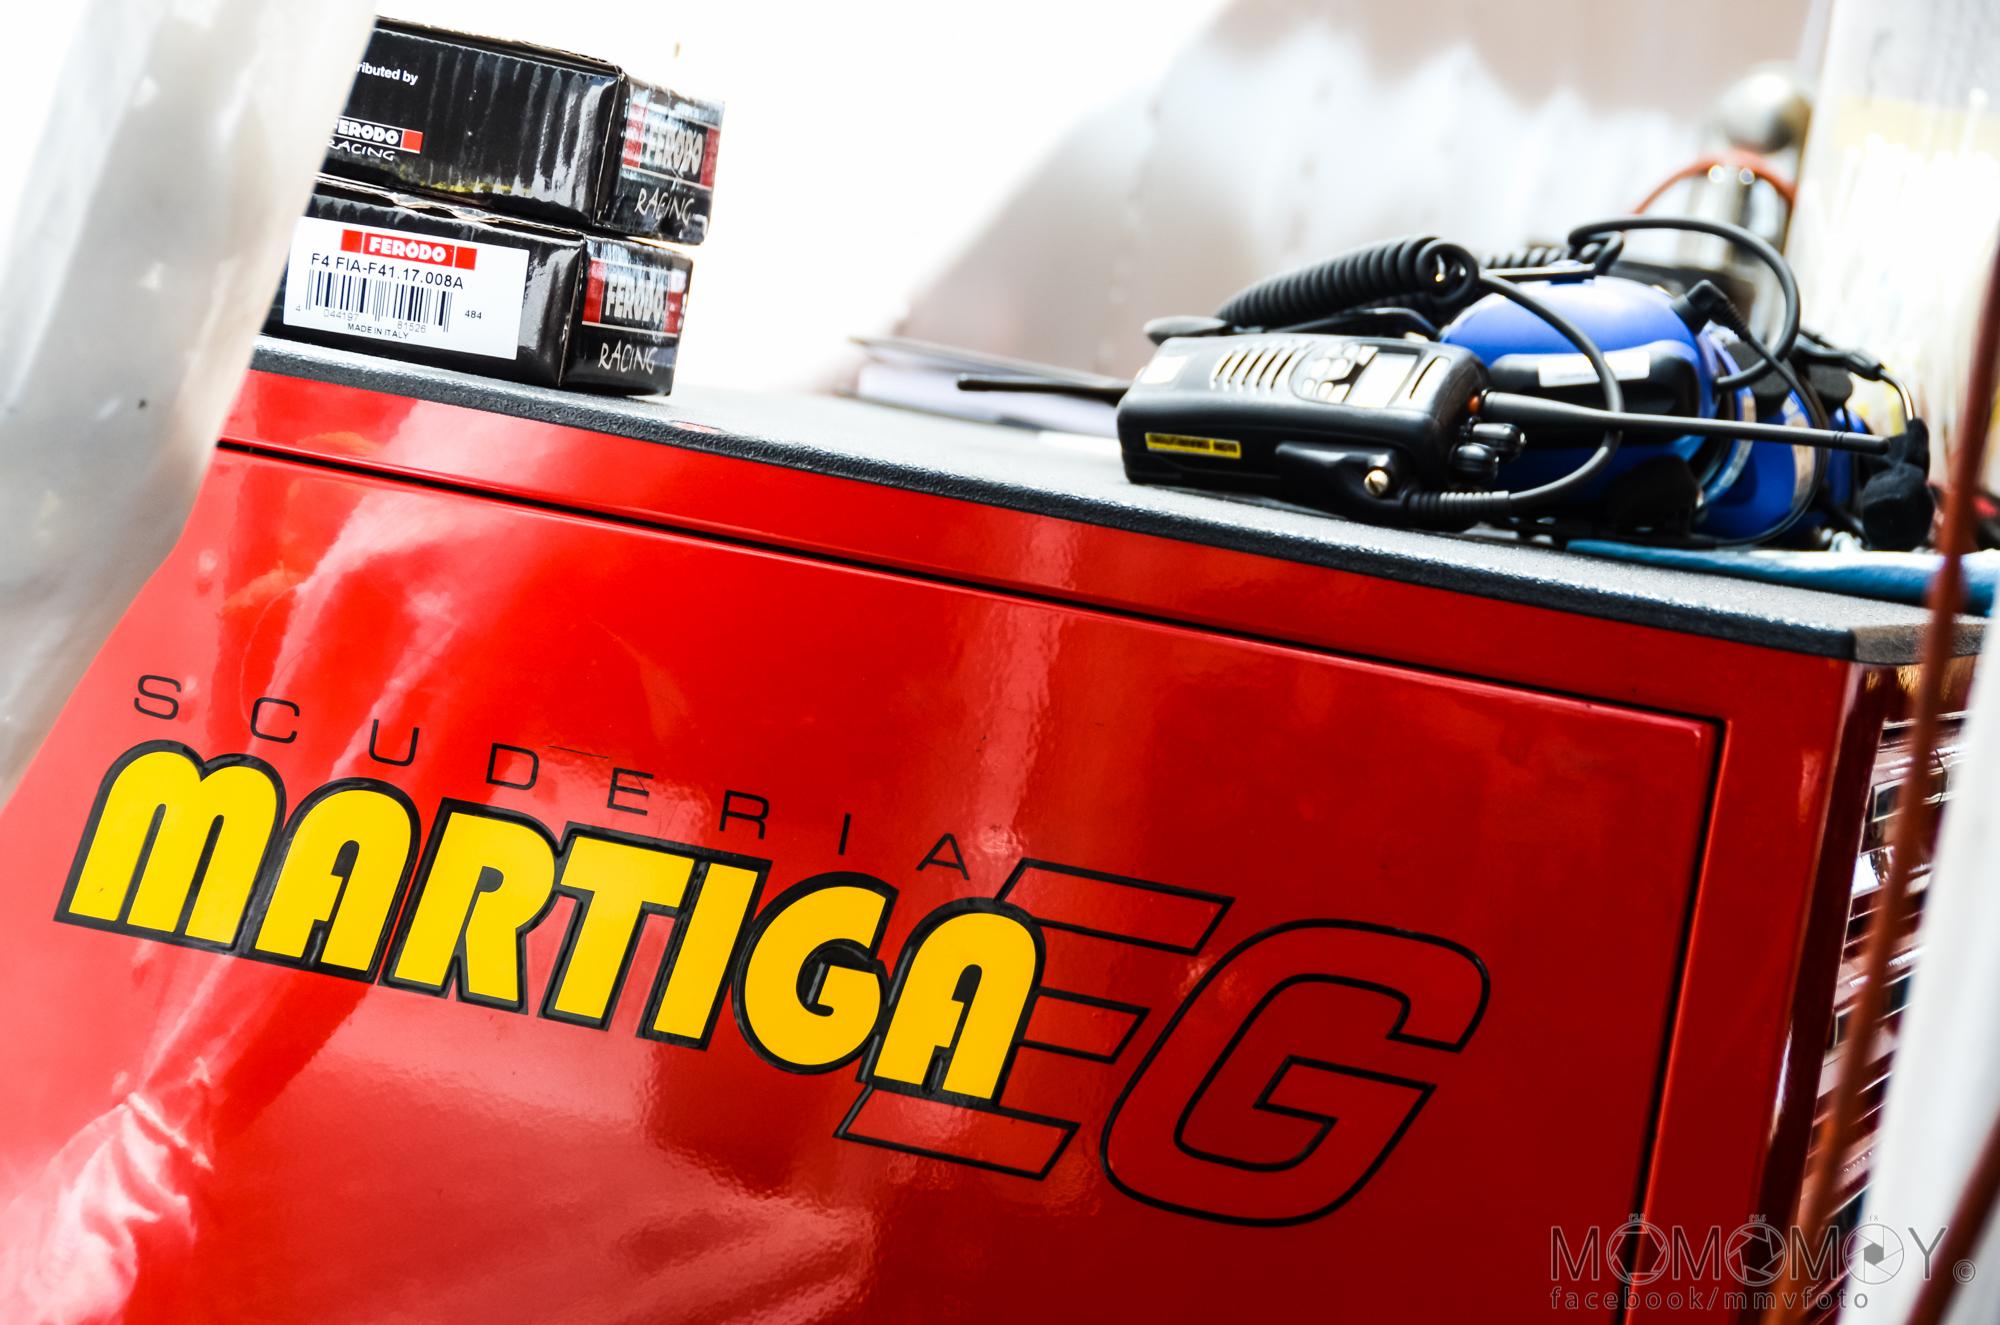 F4 Pegaso with Martiga EG